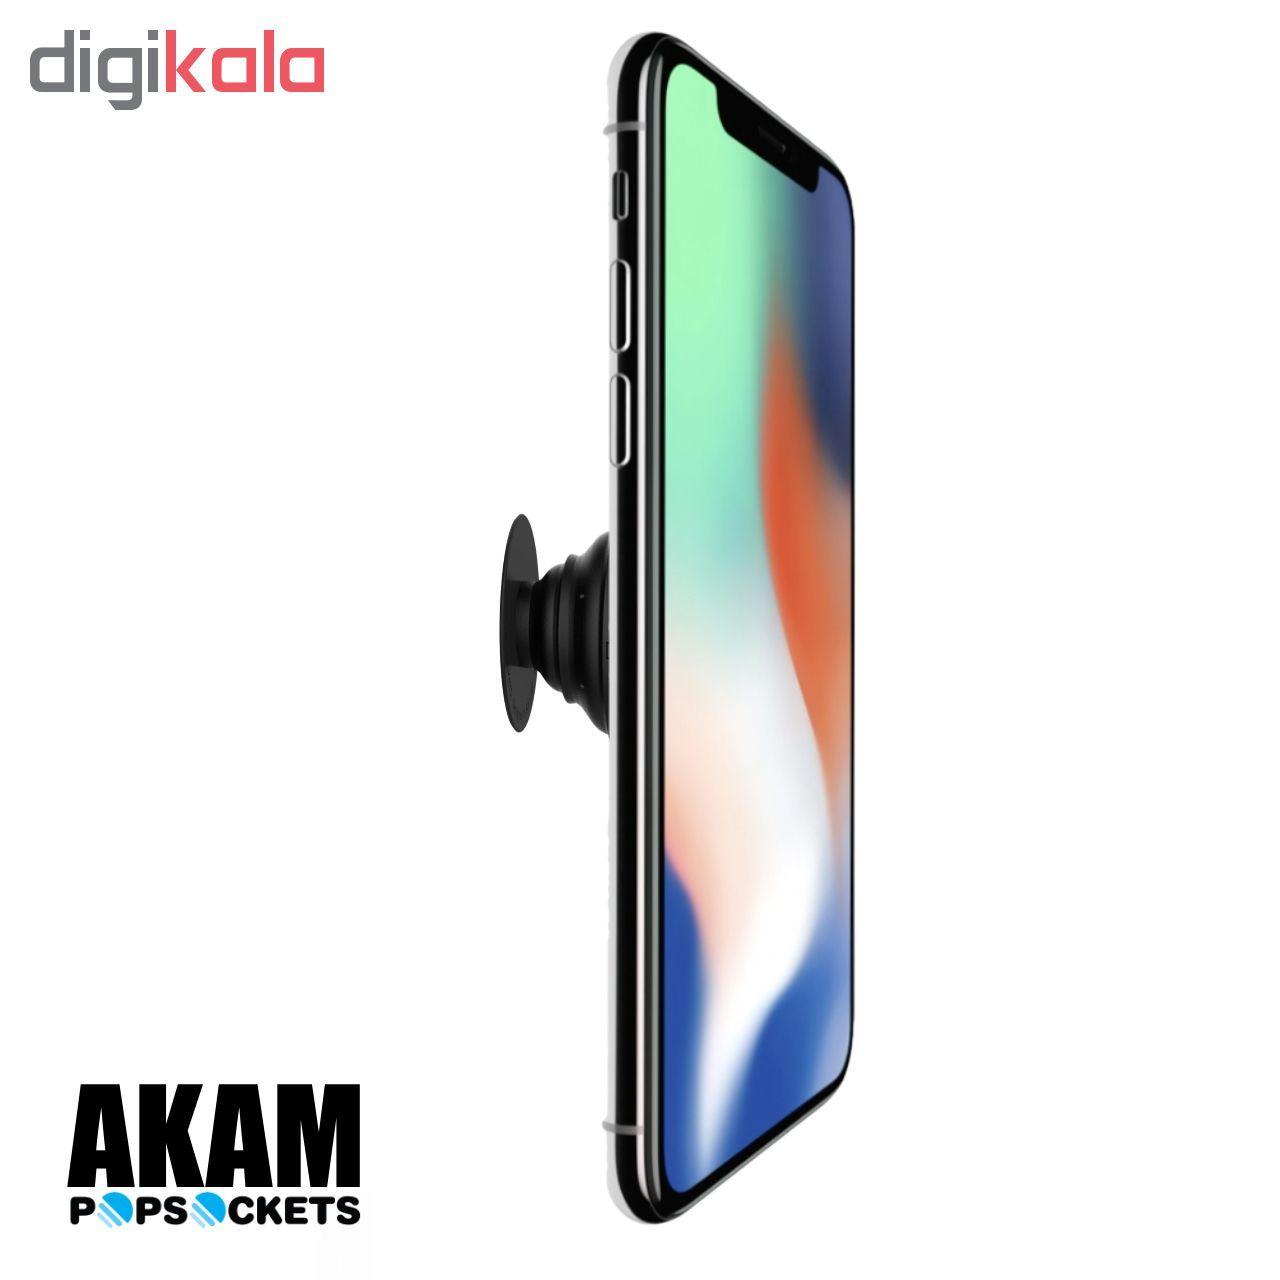 پایه نگهدارنده گوشی موبایل پاپ سوکت آکام مدل APS0195 main 1 10